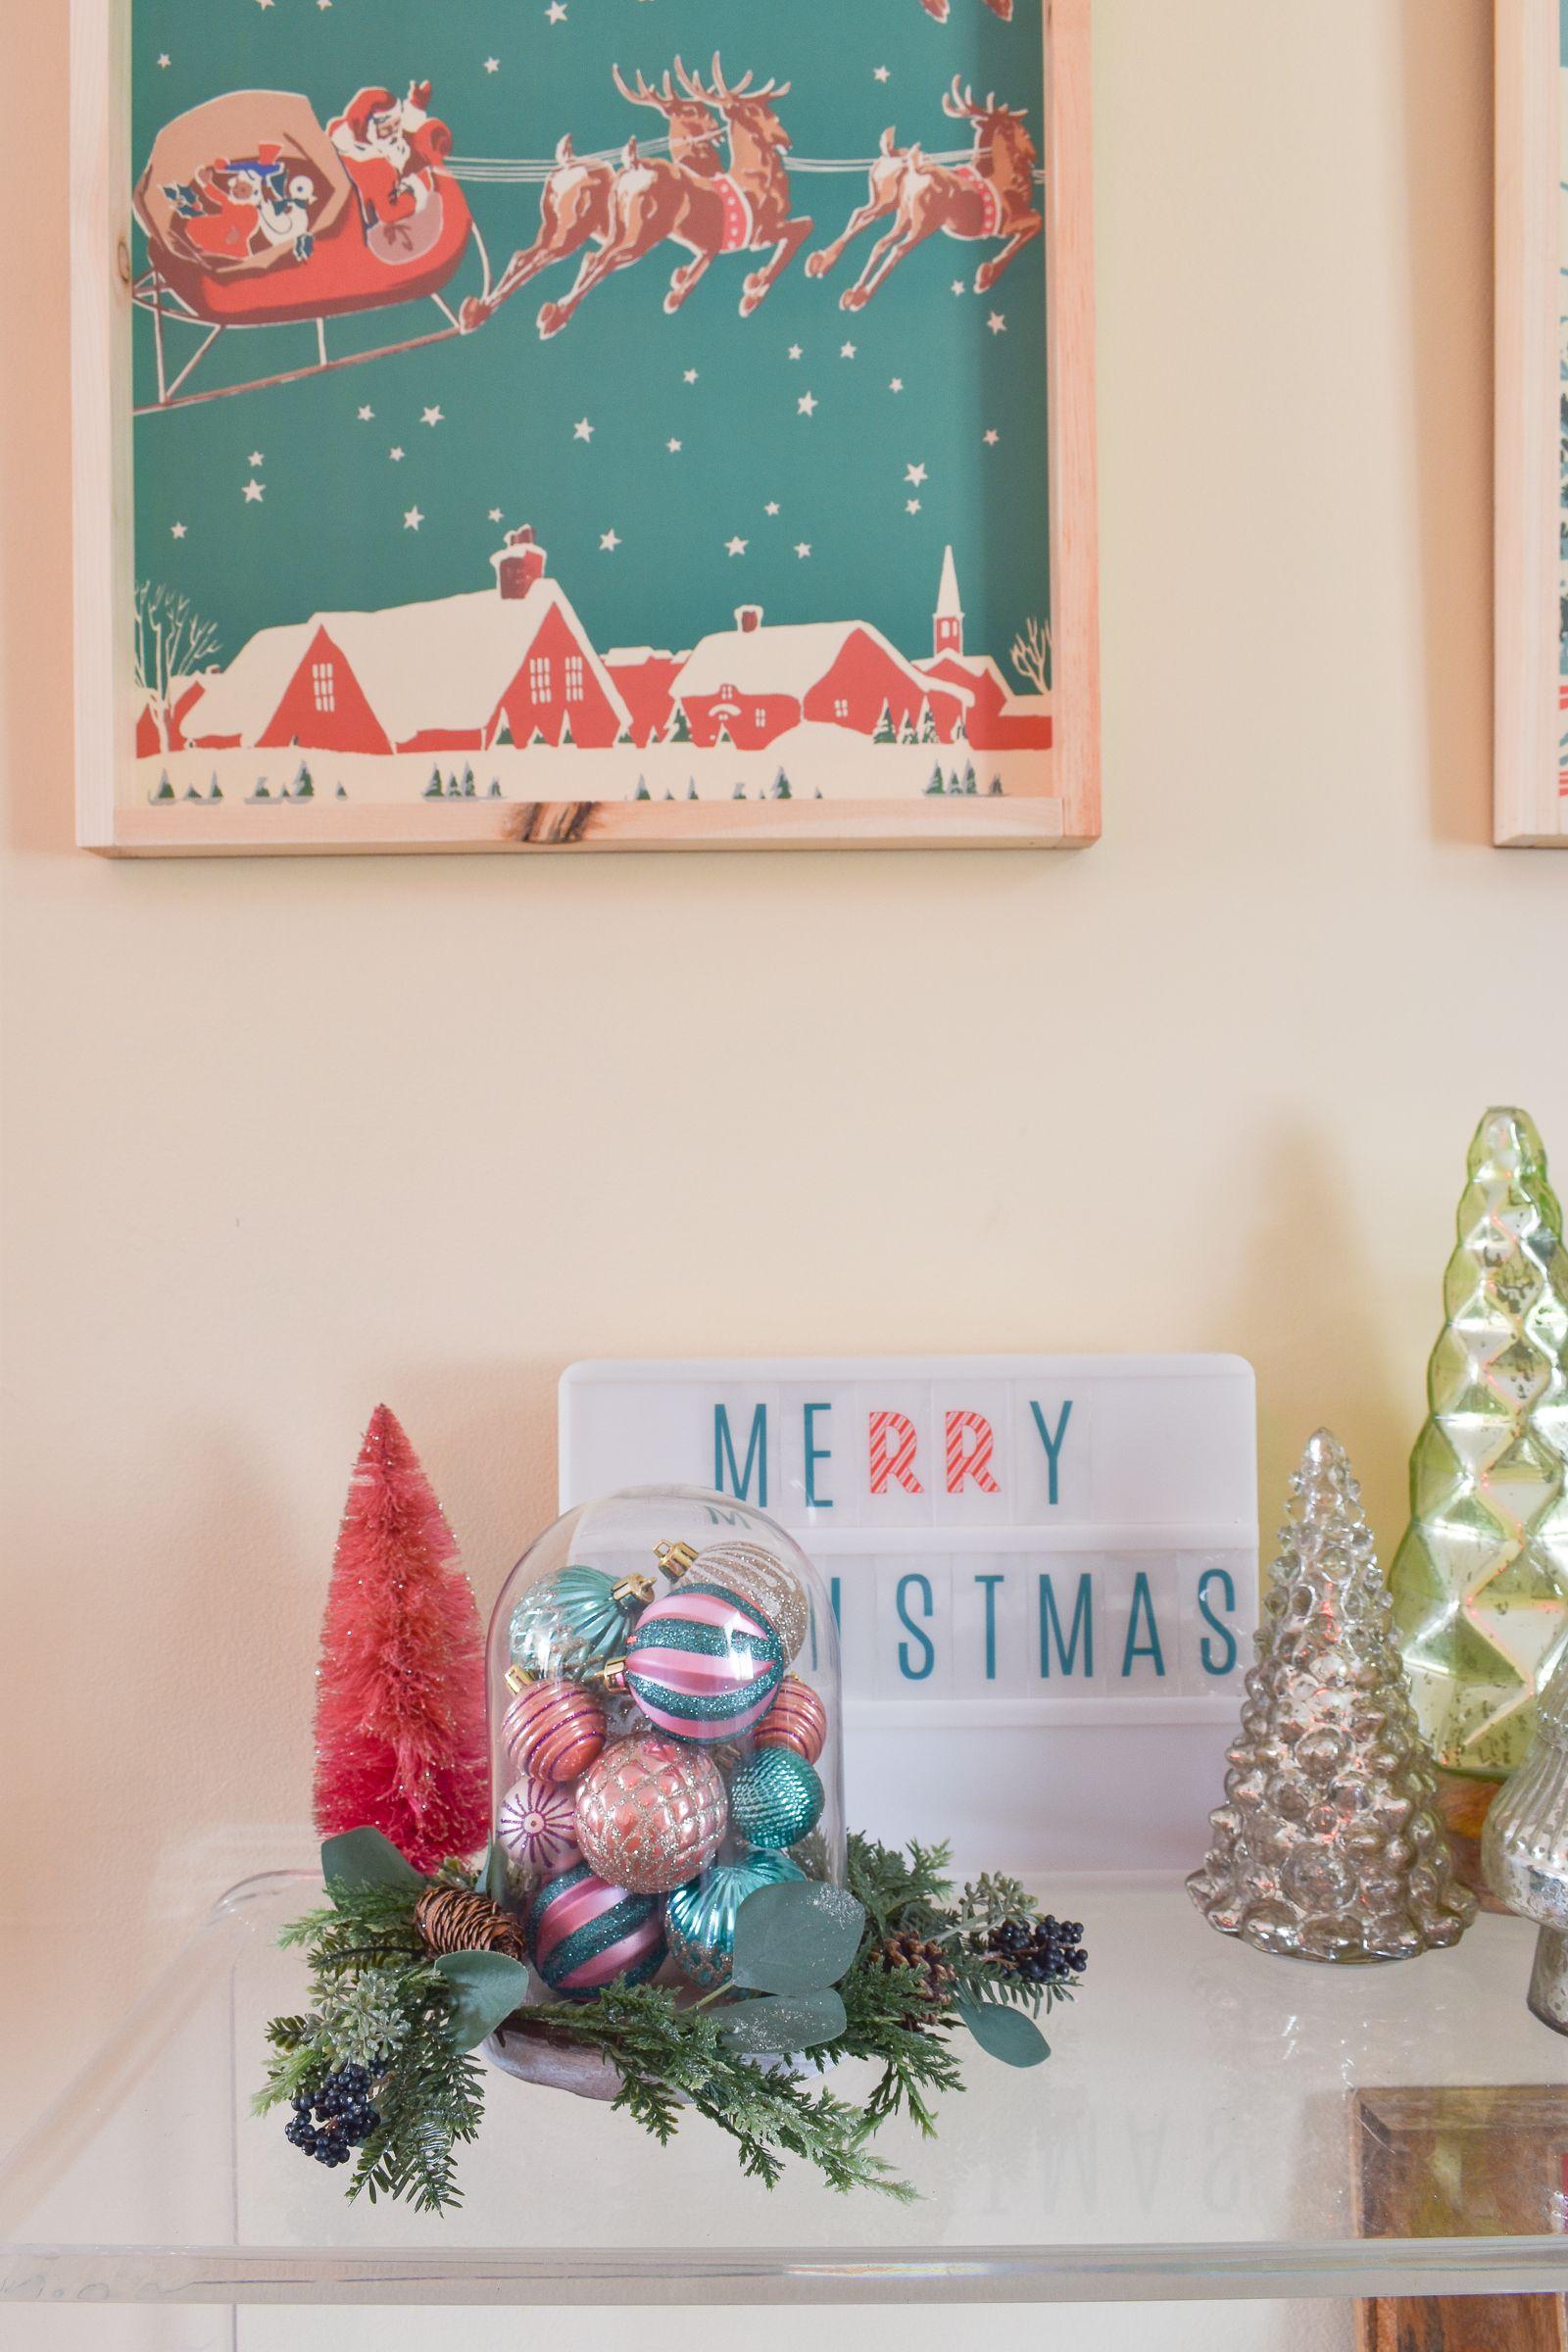 Diy Retro Christmas Art Retro Christmas Retro Christmas Decorations Christmas Diy